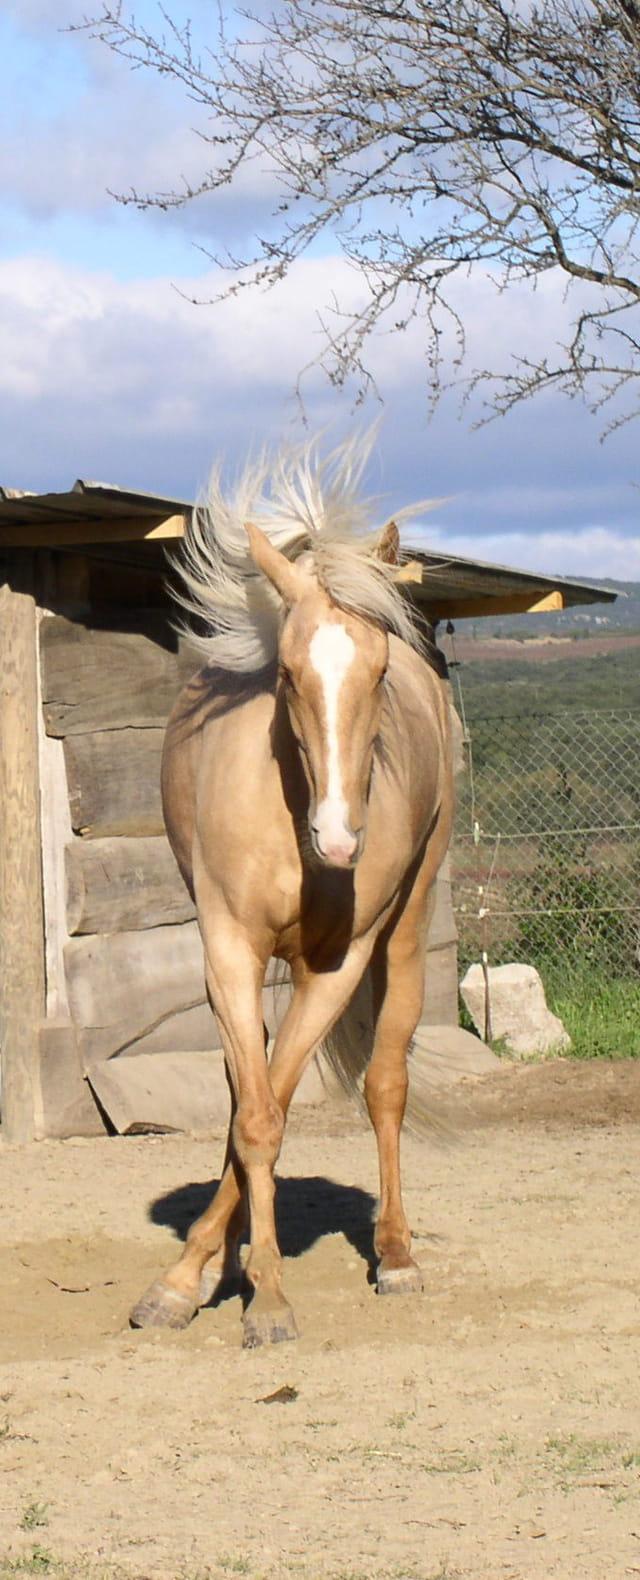 Mon cheval Caly danse